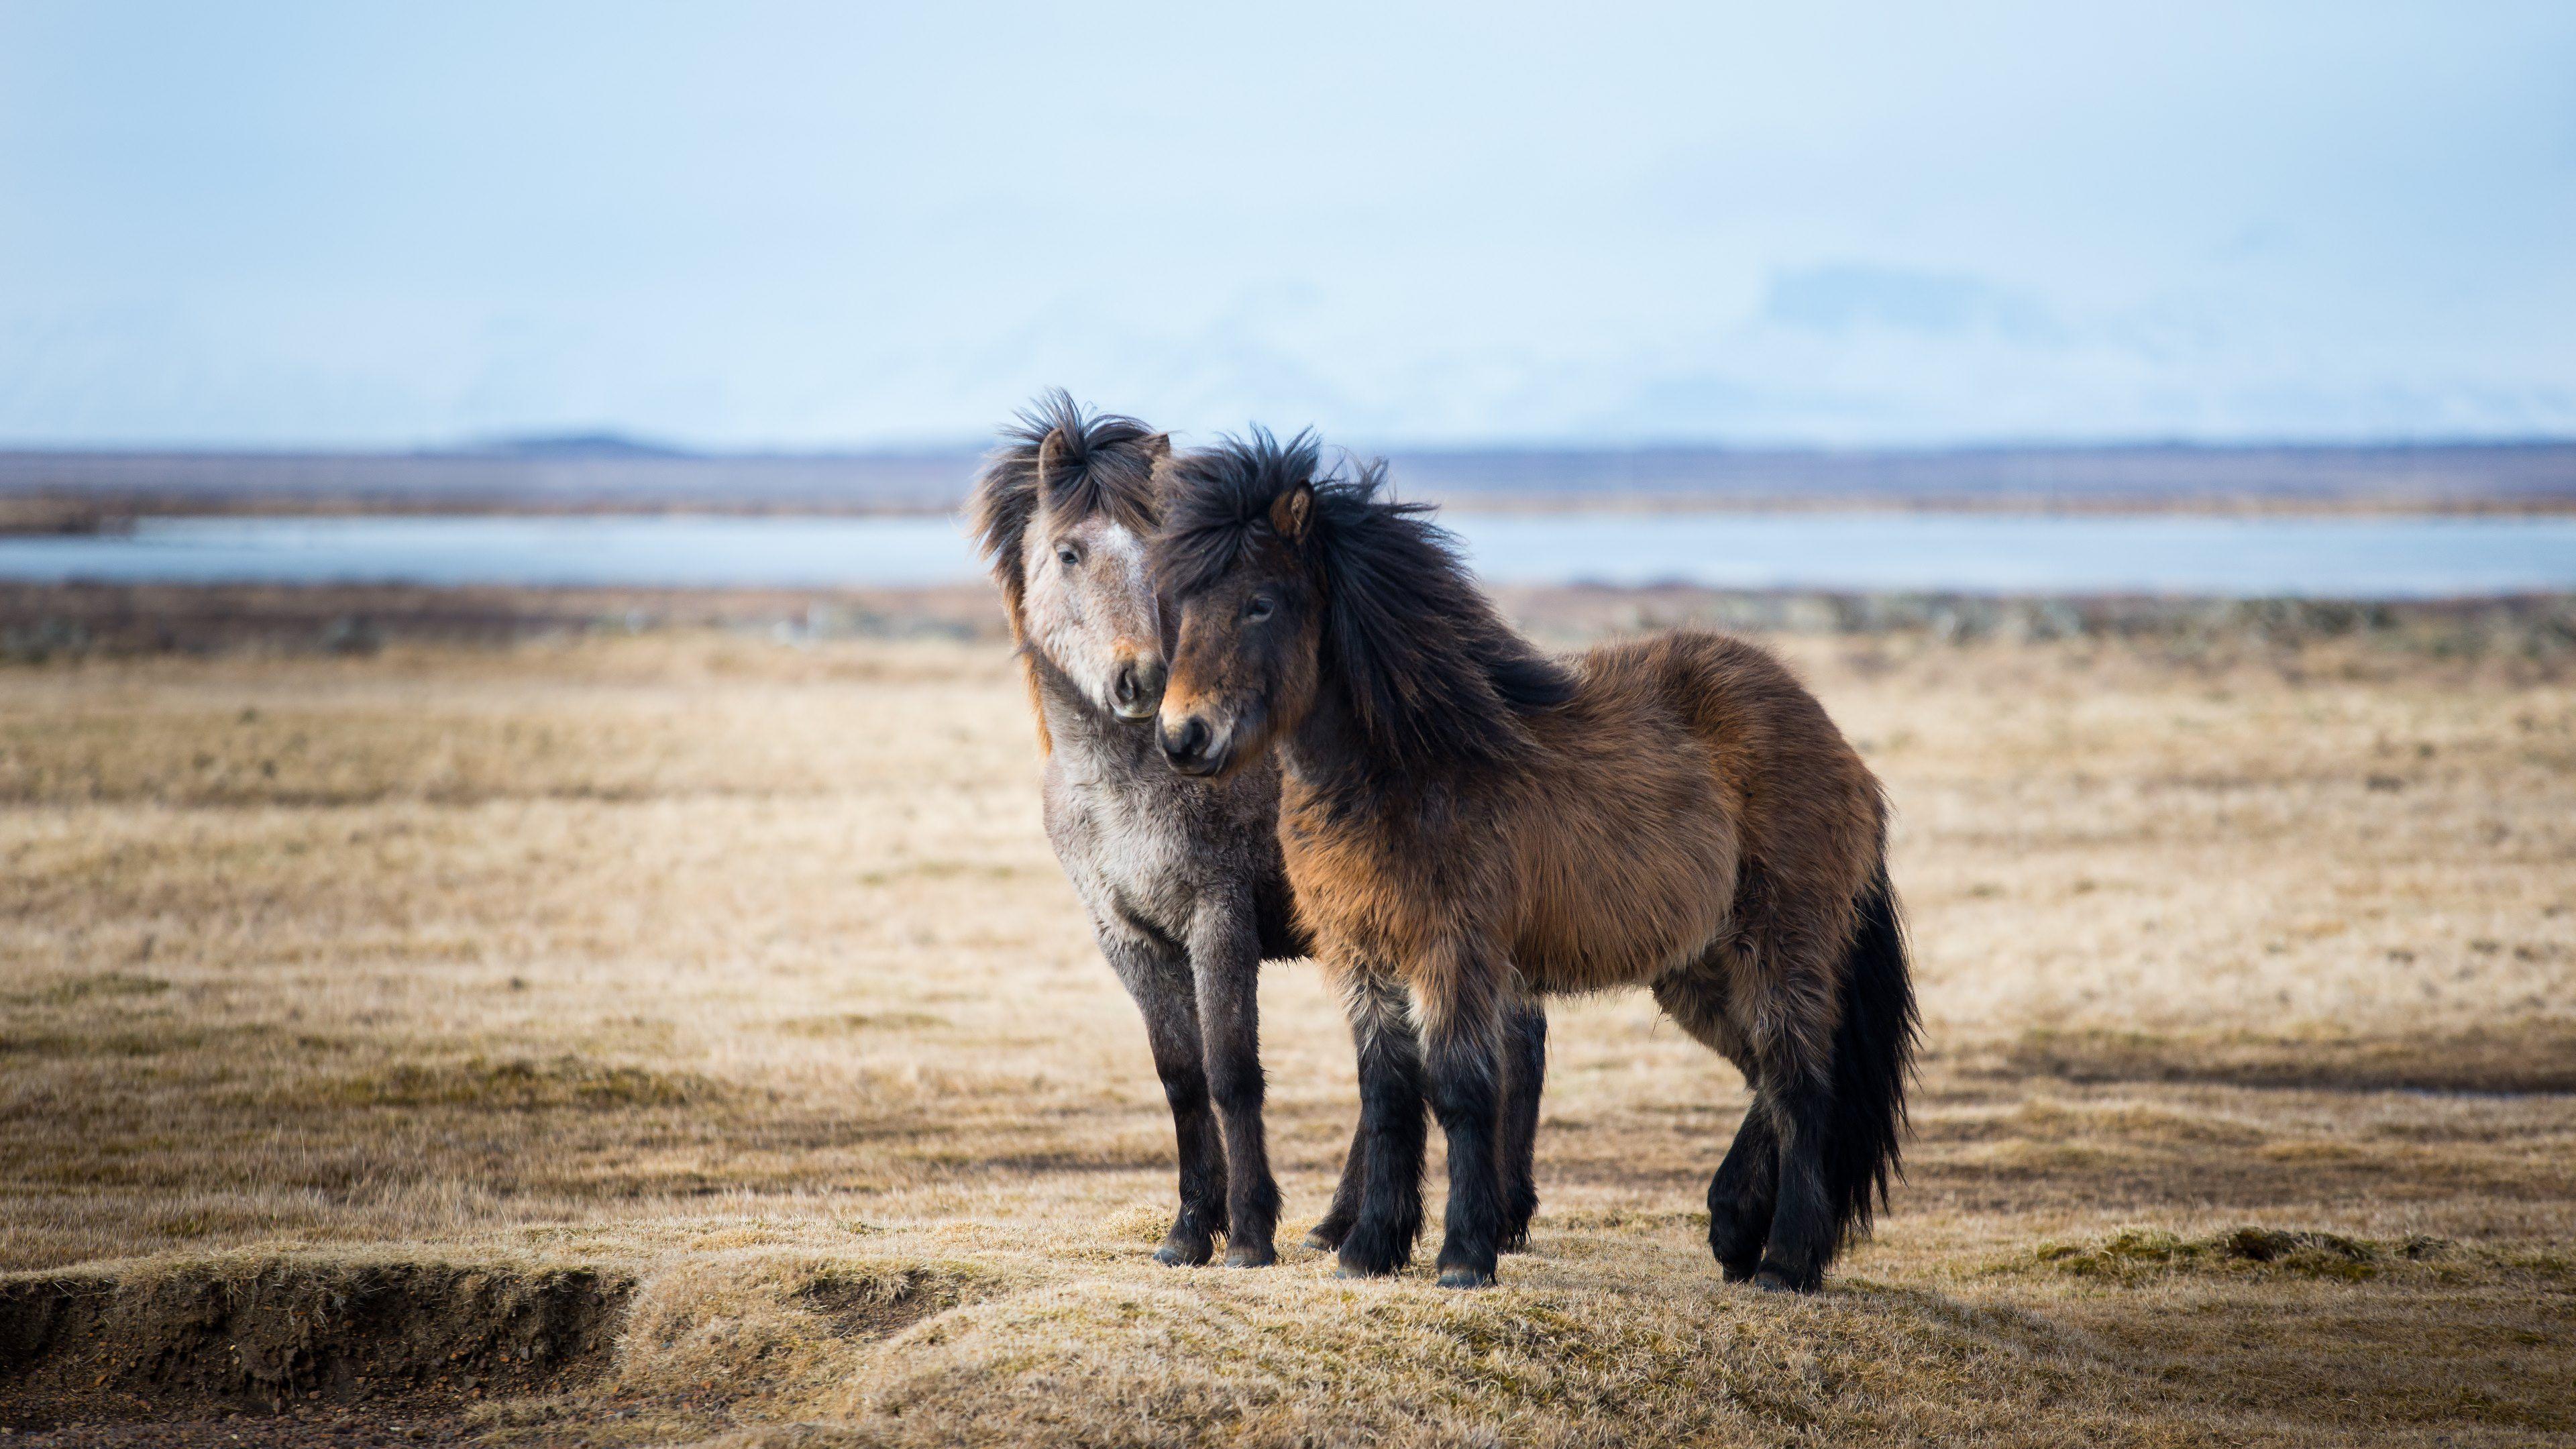 Horse Breeds - Icelandic Horse